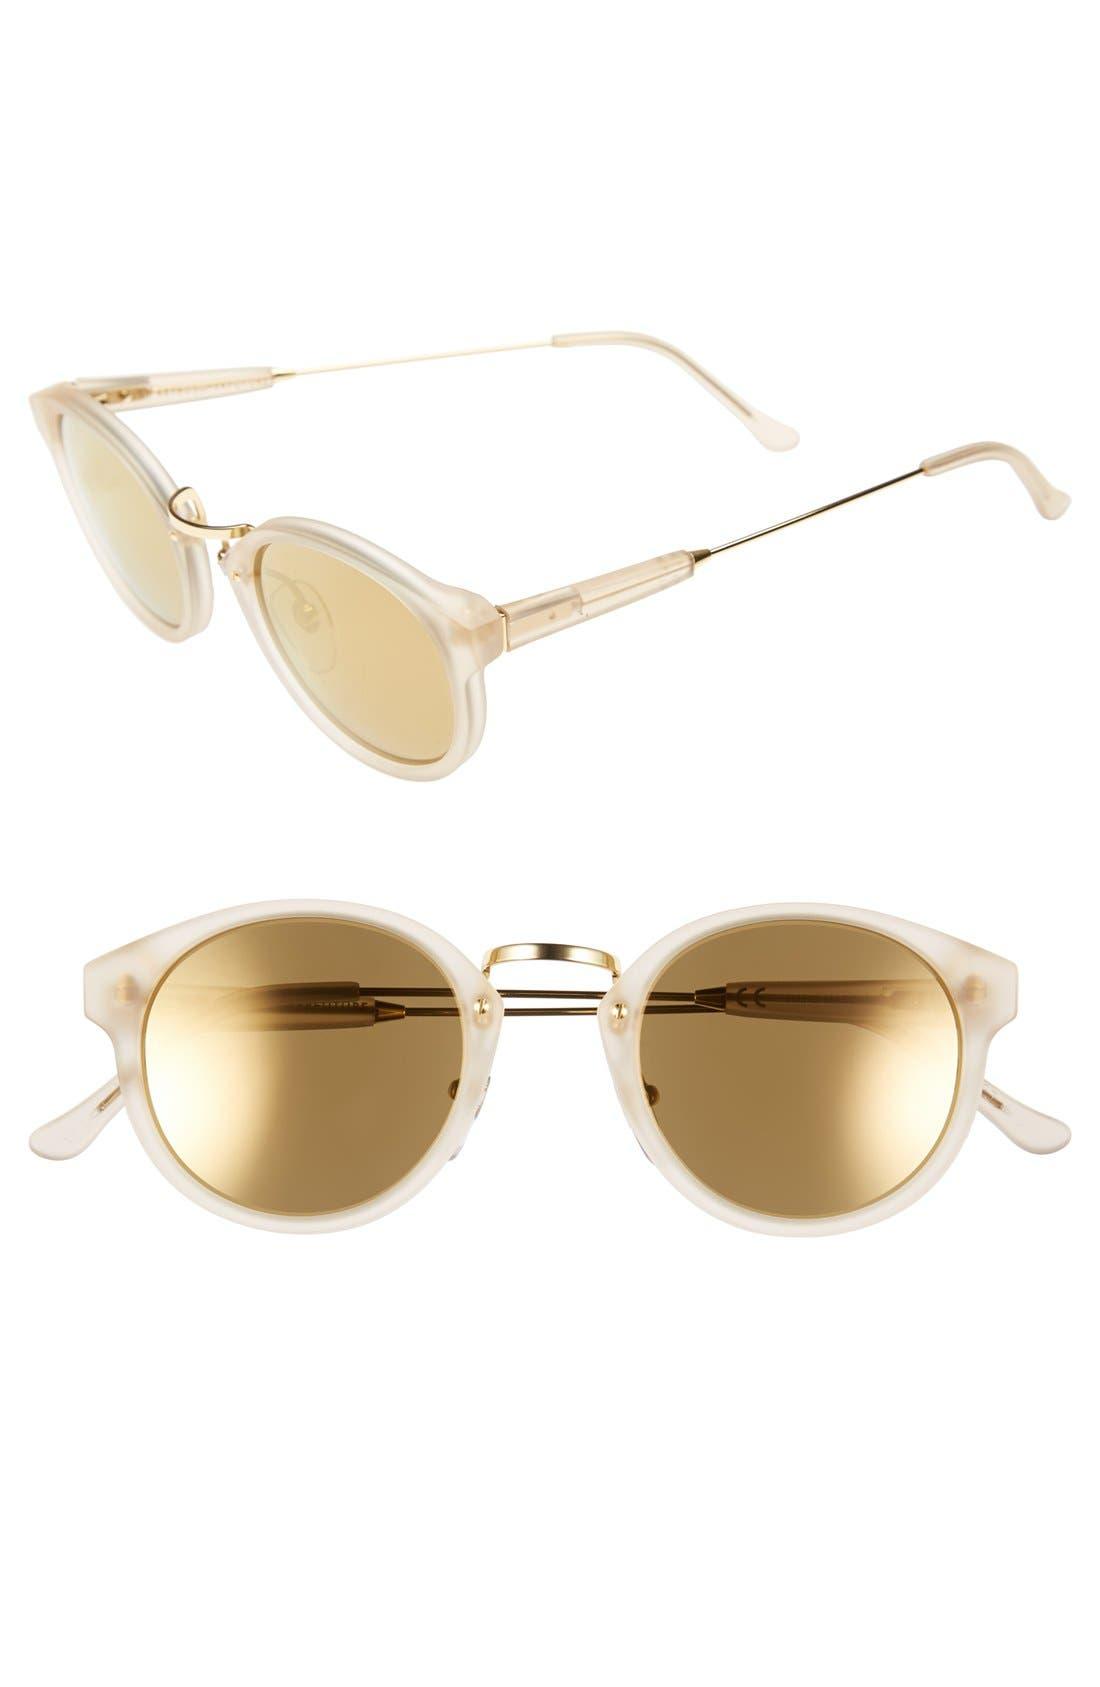 Main Image - SUPER by RETROSUPERFUTURE® 'Panama' 46mm Mirrored Sunglasses